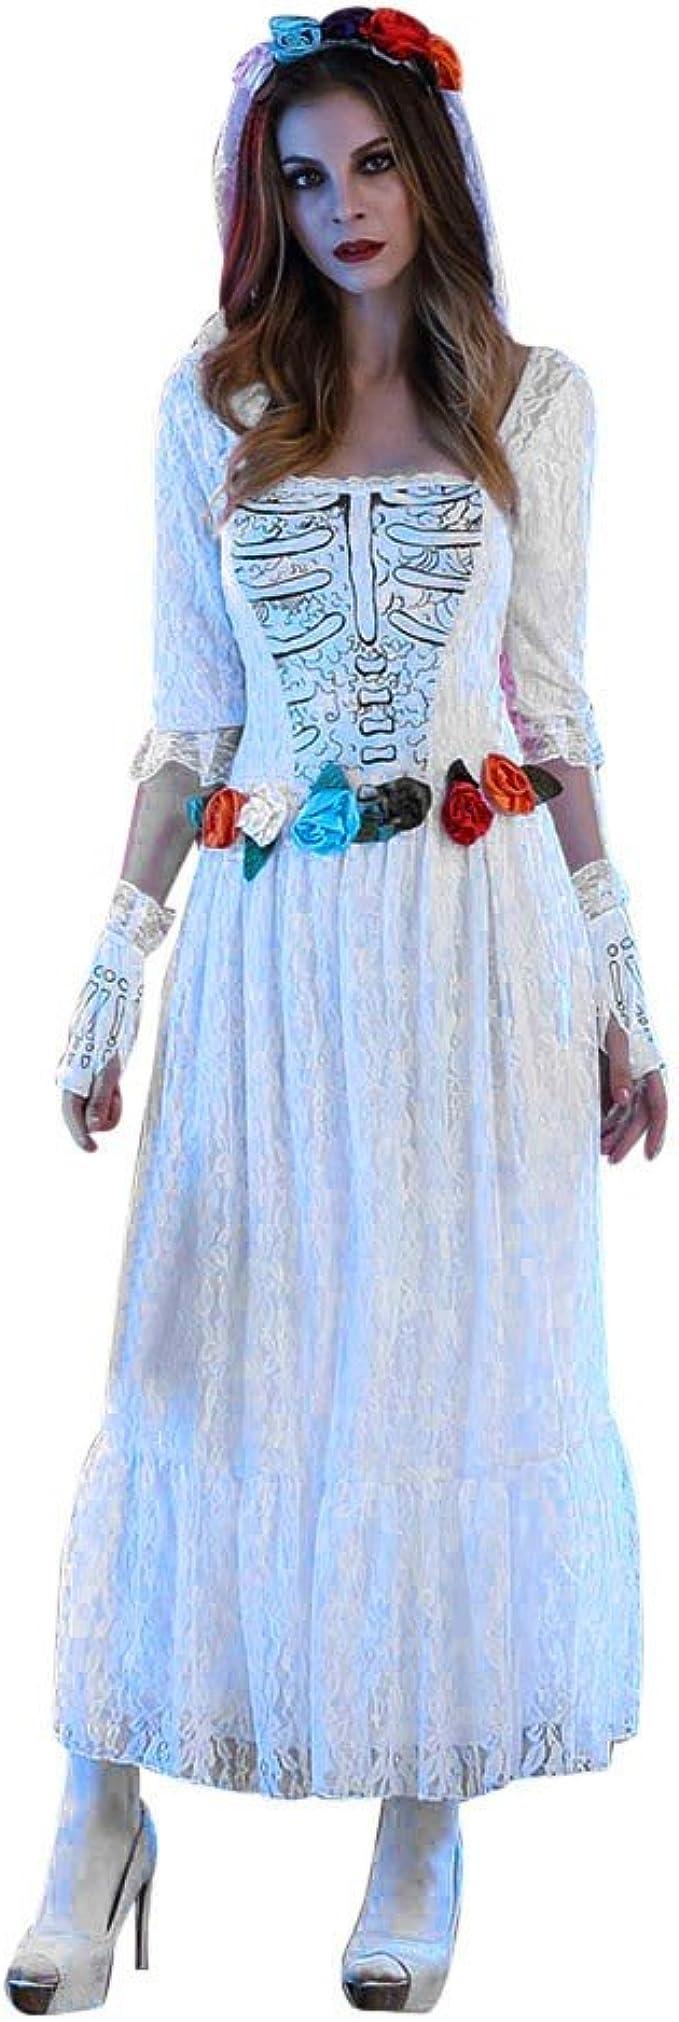 Goosun Disfraces Halloween Mujer Disfraz Novia Cadaver Halloween ...